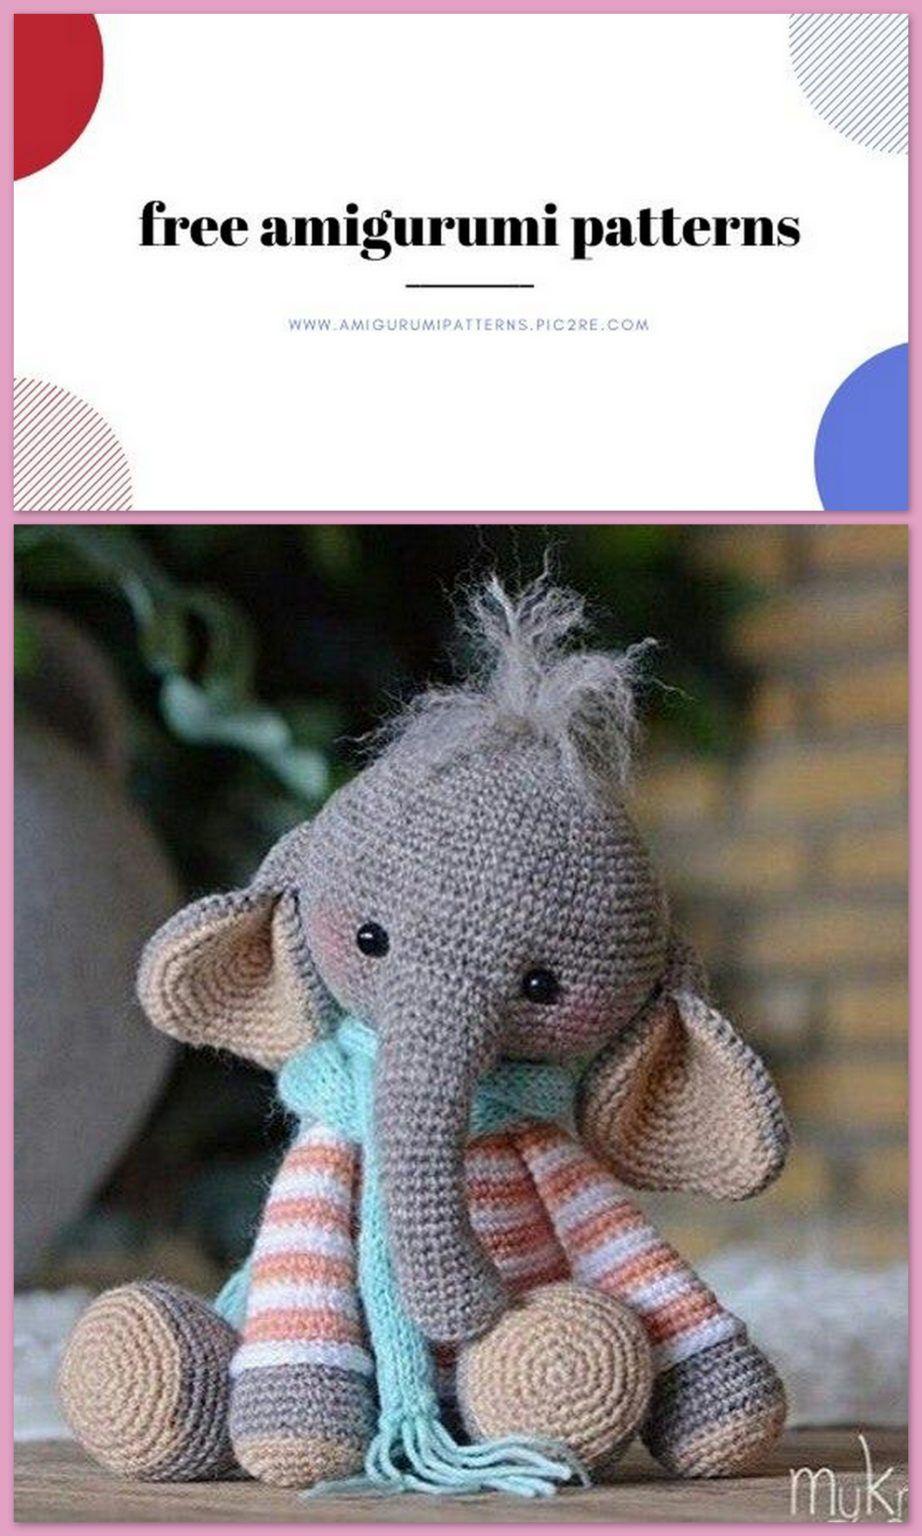 Esther the Elephant | Recipe | Crochet elephant pattern, Crochet ... | 1536x922